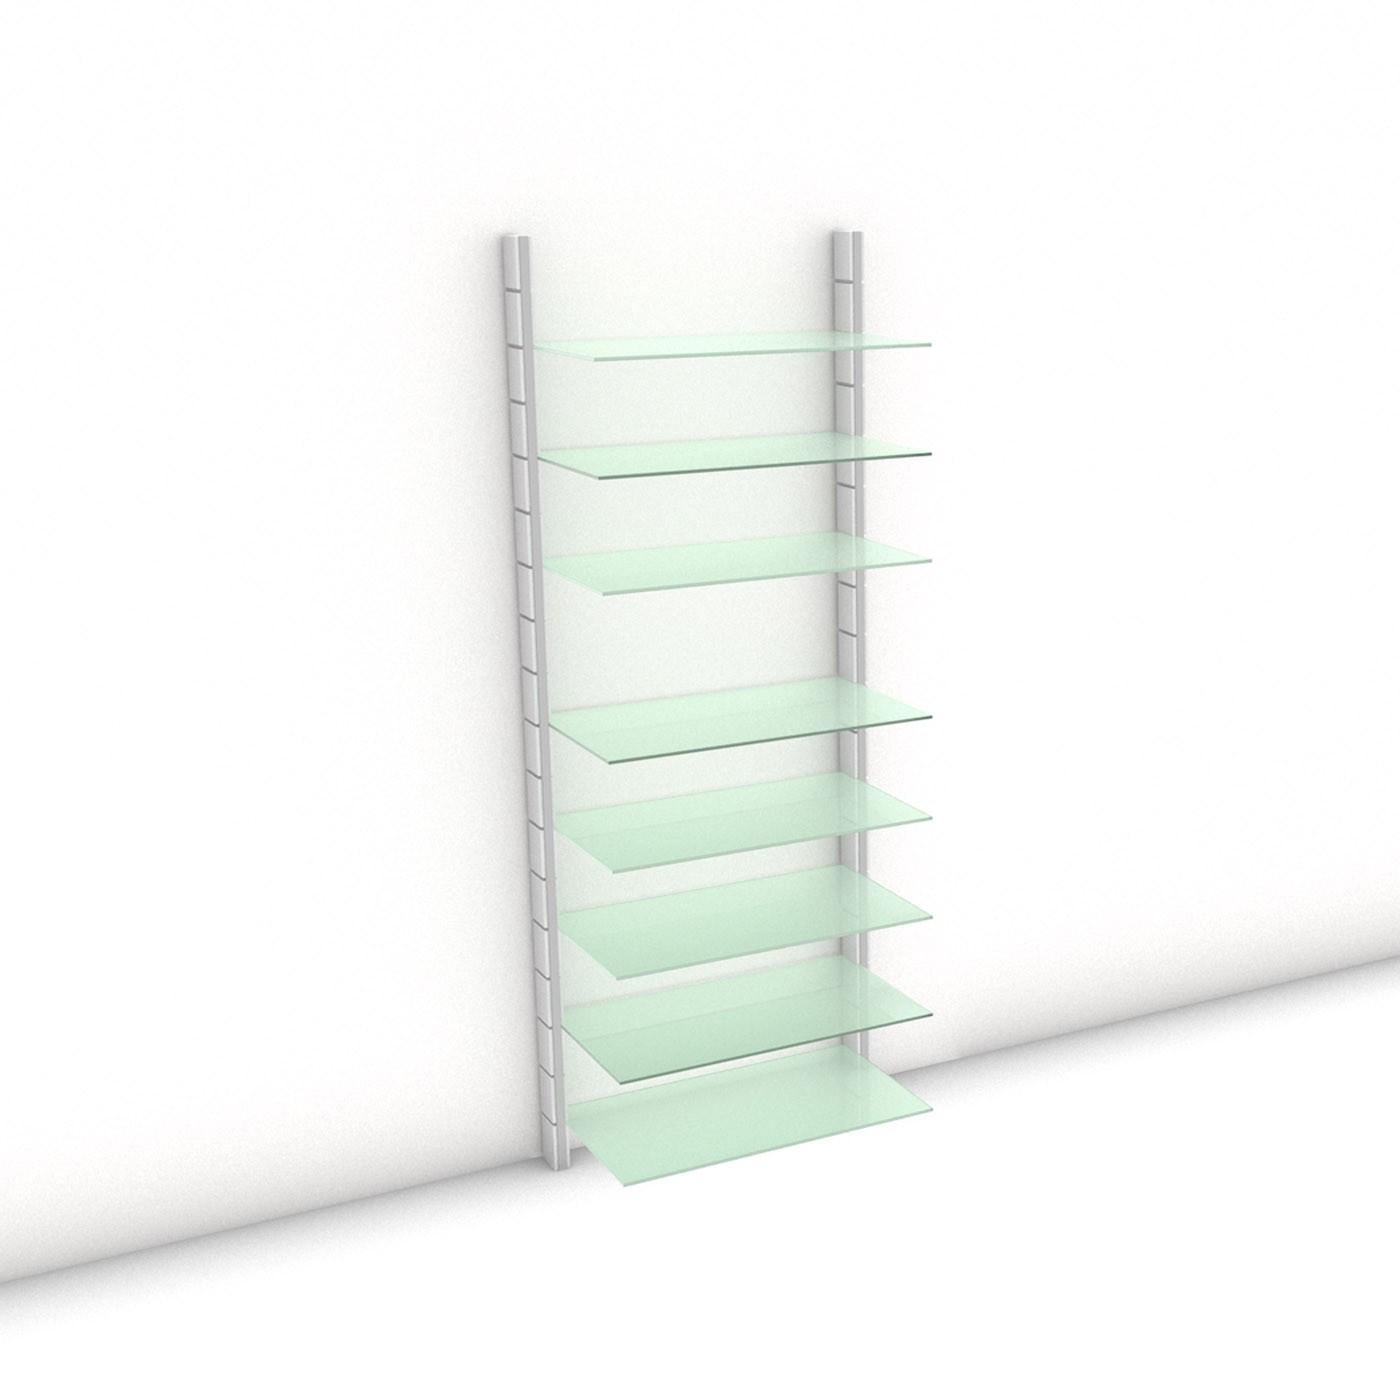 Begehbarer Kleiderschrank - Prime (XL) 84 - Maß: 84 x 215,2 x 45 cm (B x H x T)